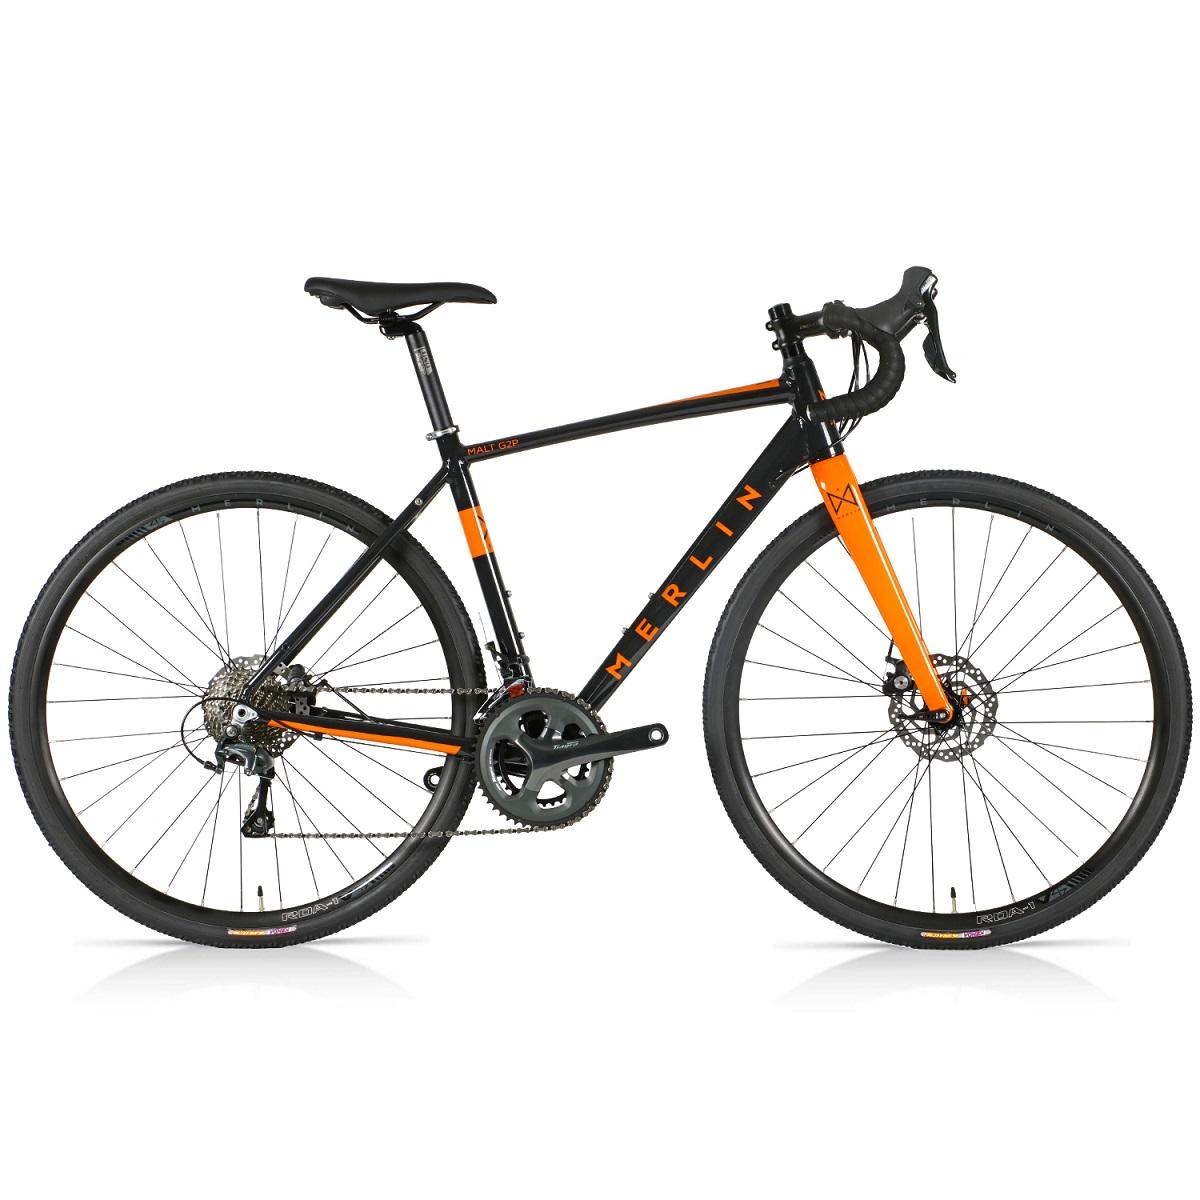 80530 merlin malt g2p tiagra gravel bike 2021